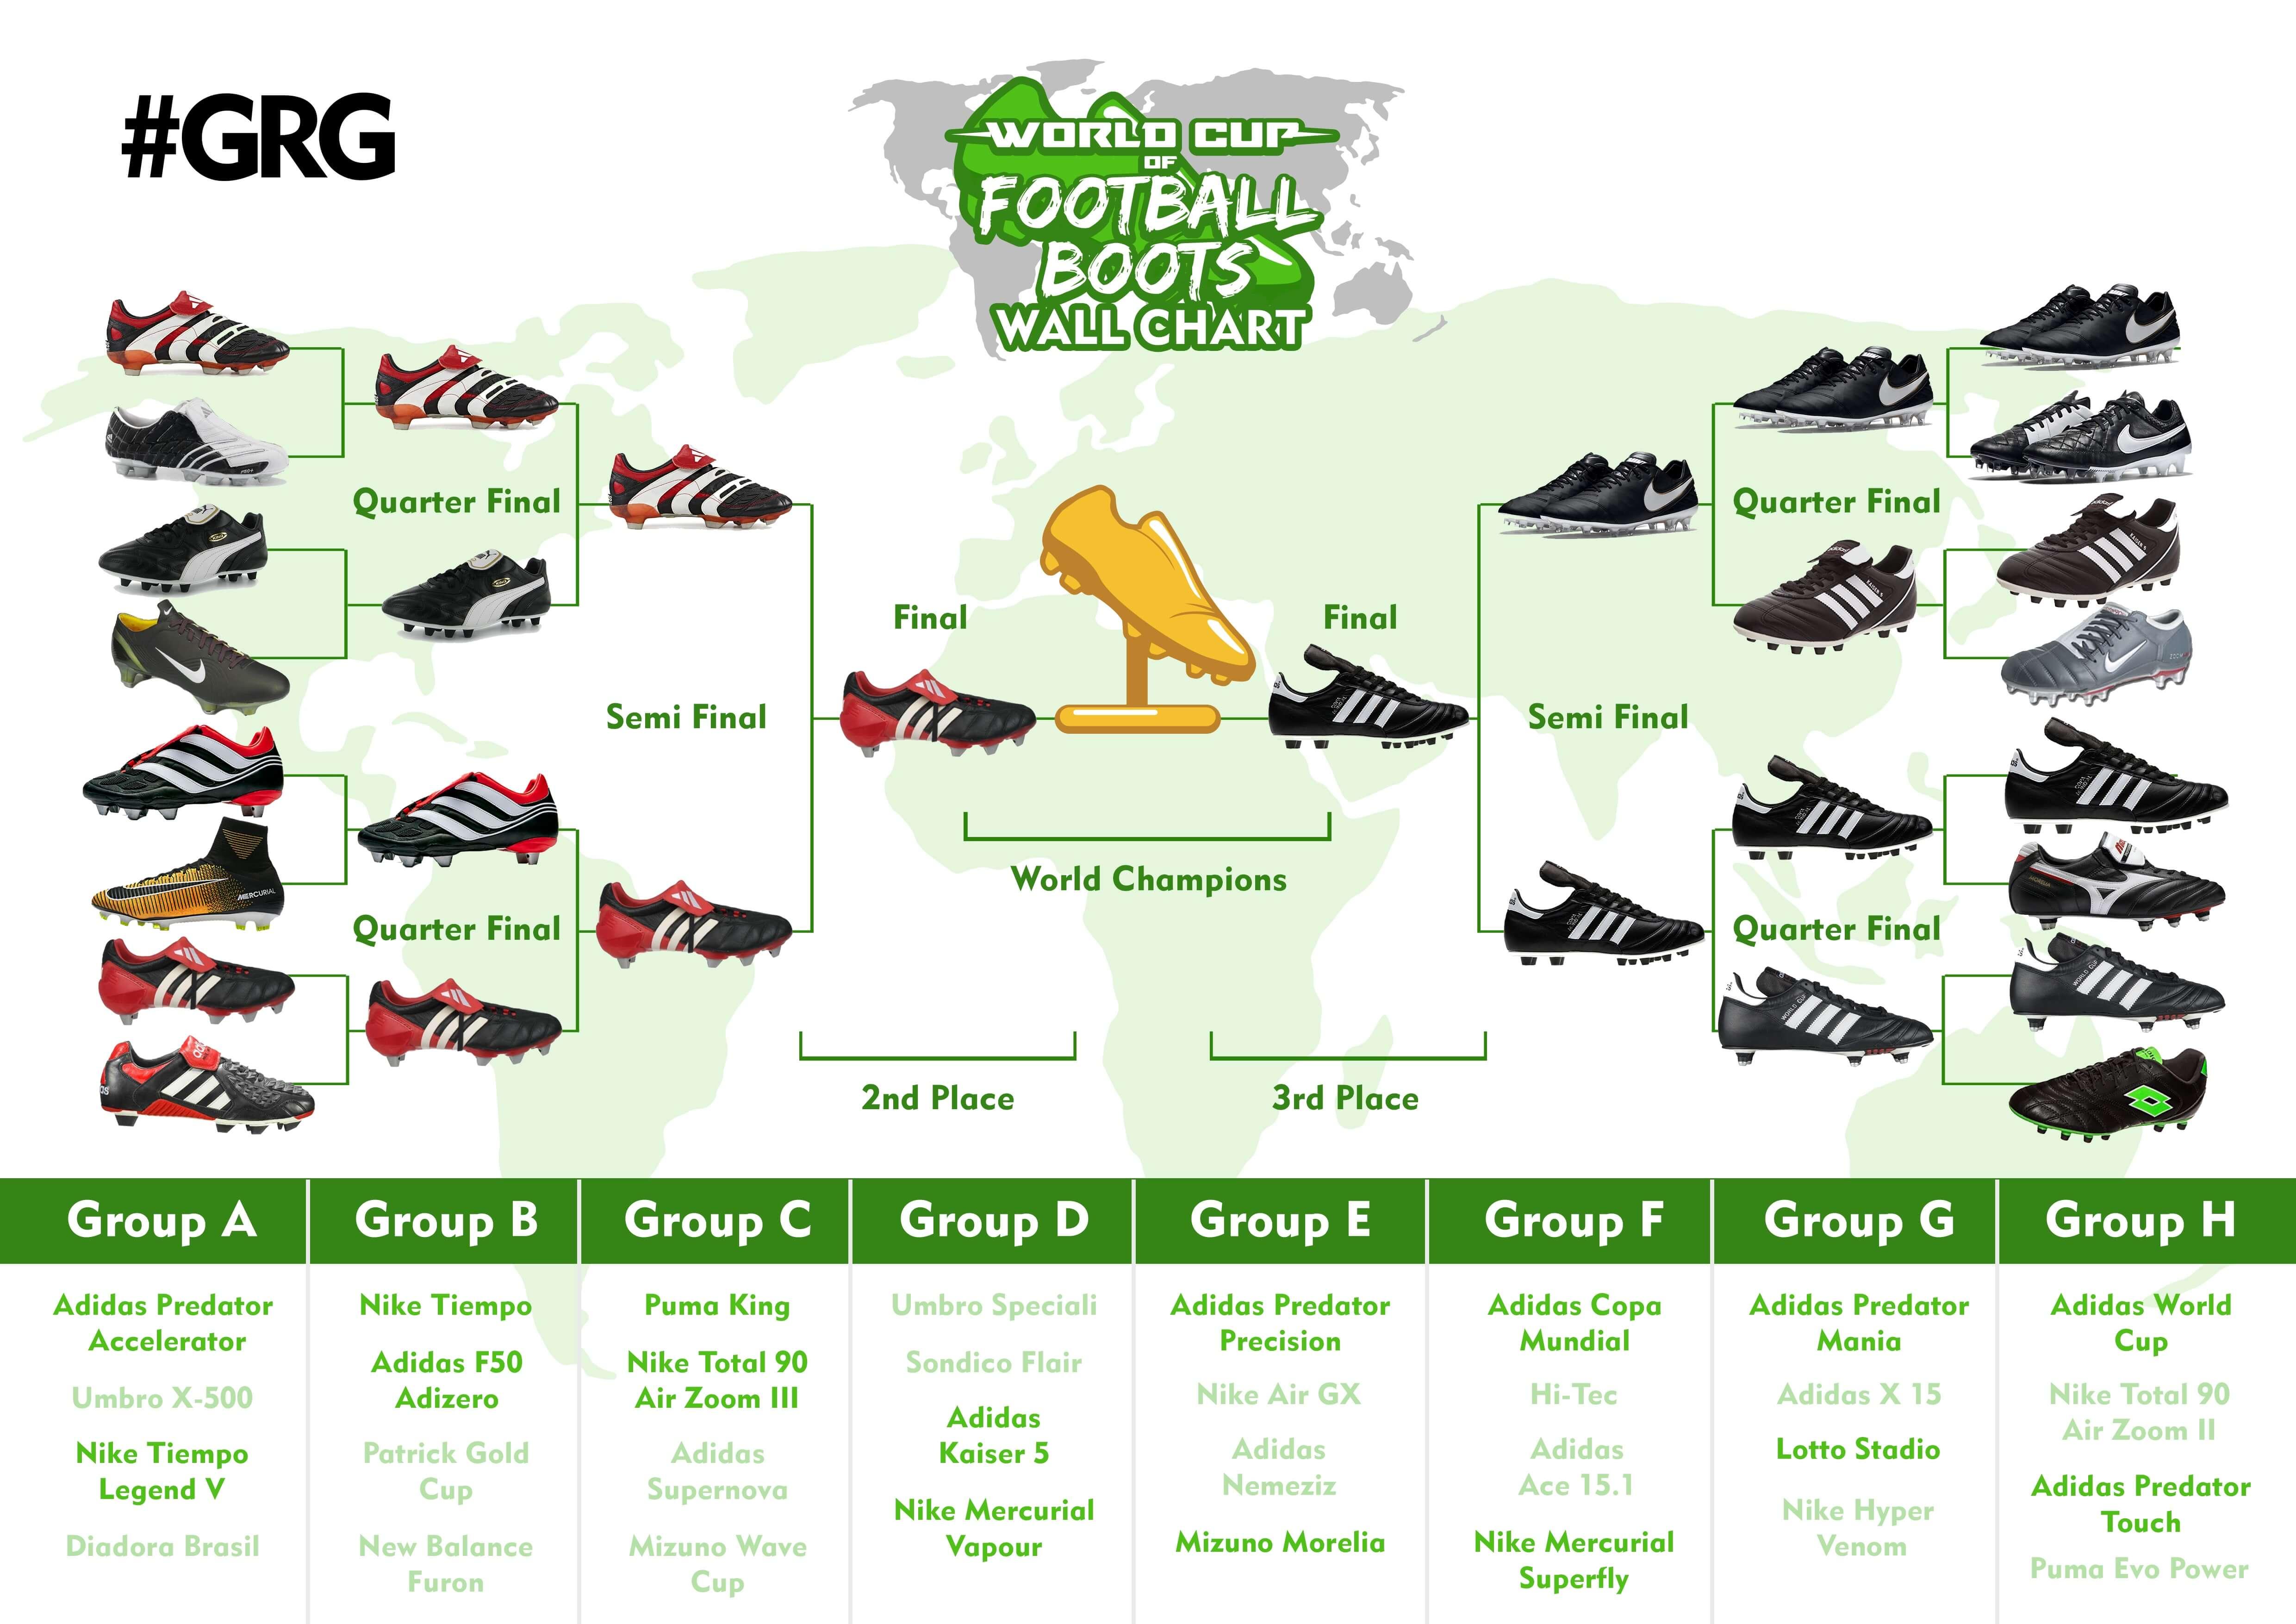 World Cup of Football Boots Wall Chart.jpg